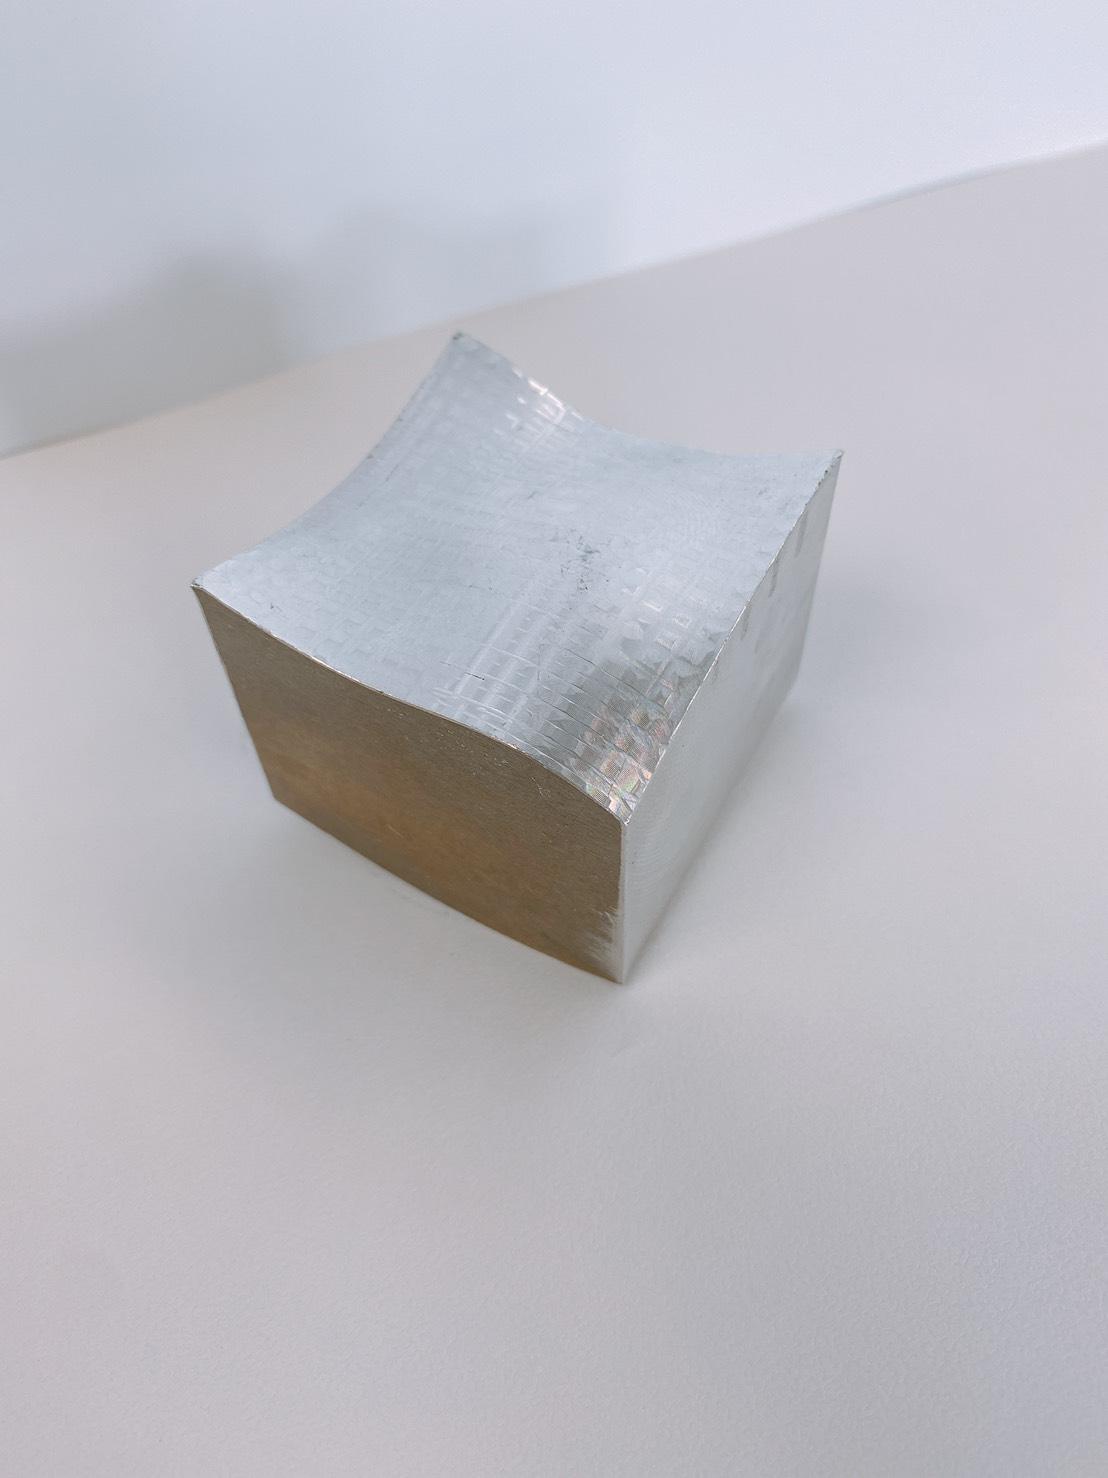 切削加工部品 5軸マシニング加工 自由曲面加工